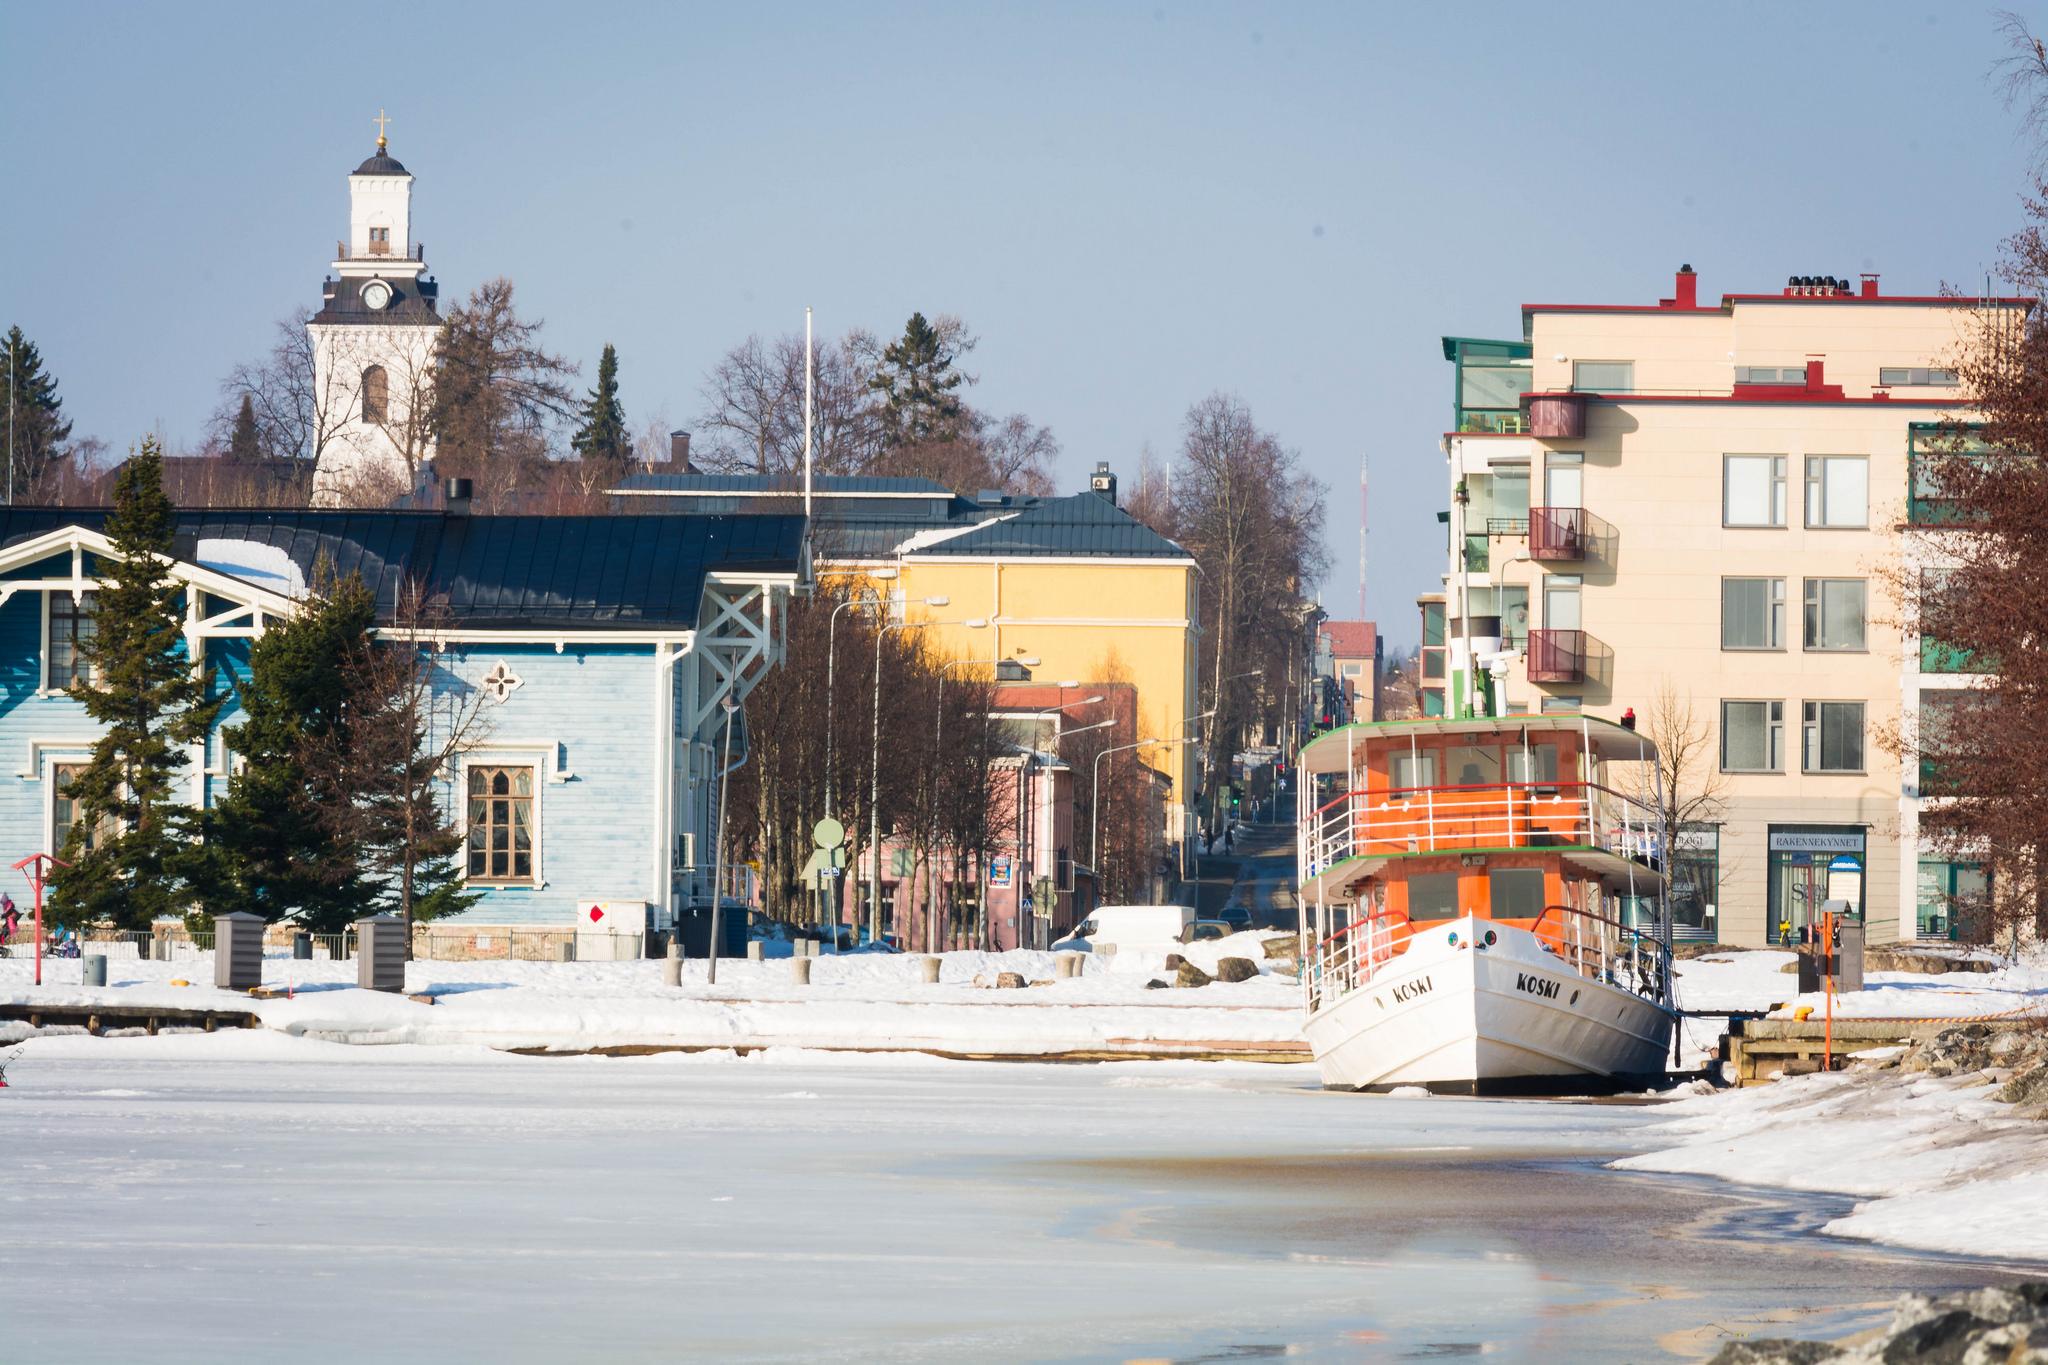 Kuopio; Satama 29.3.2016